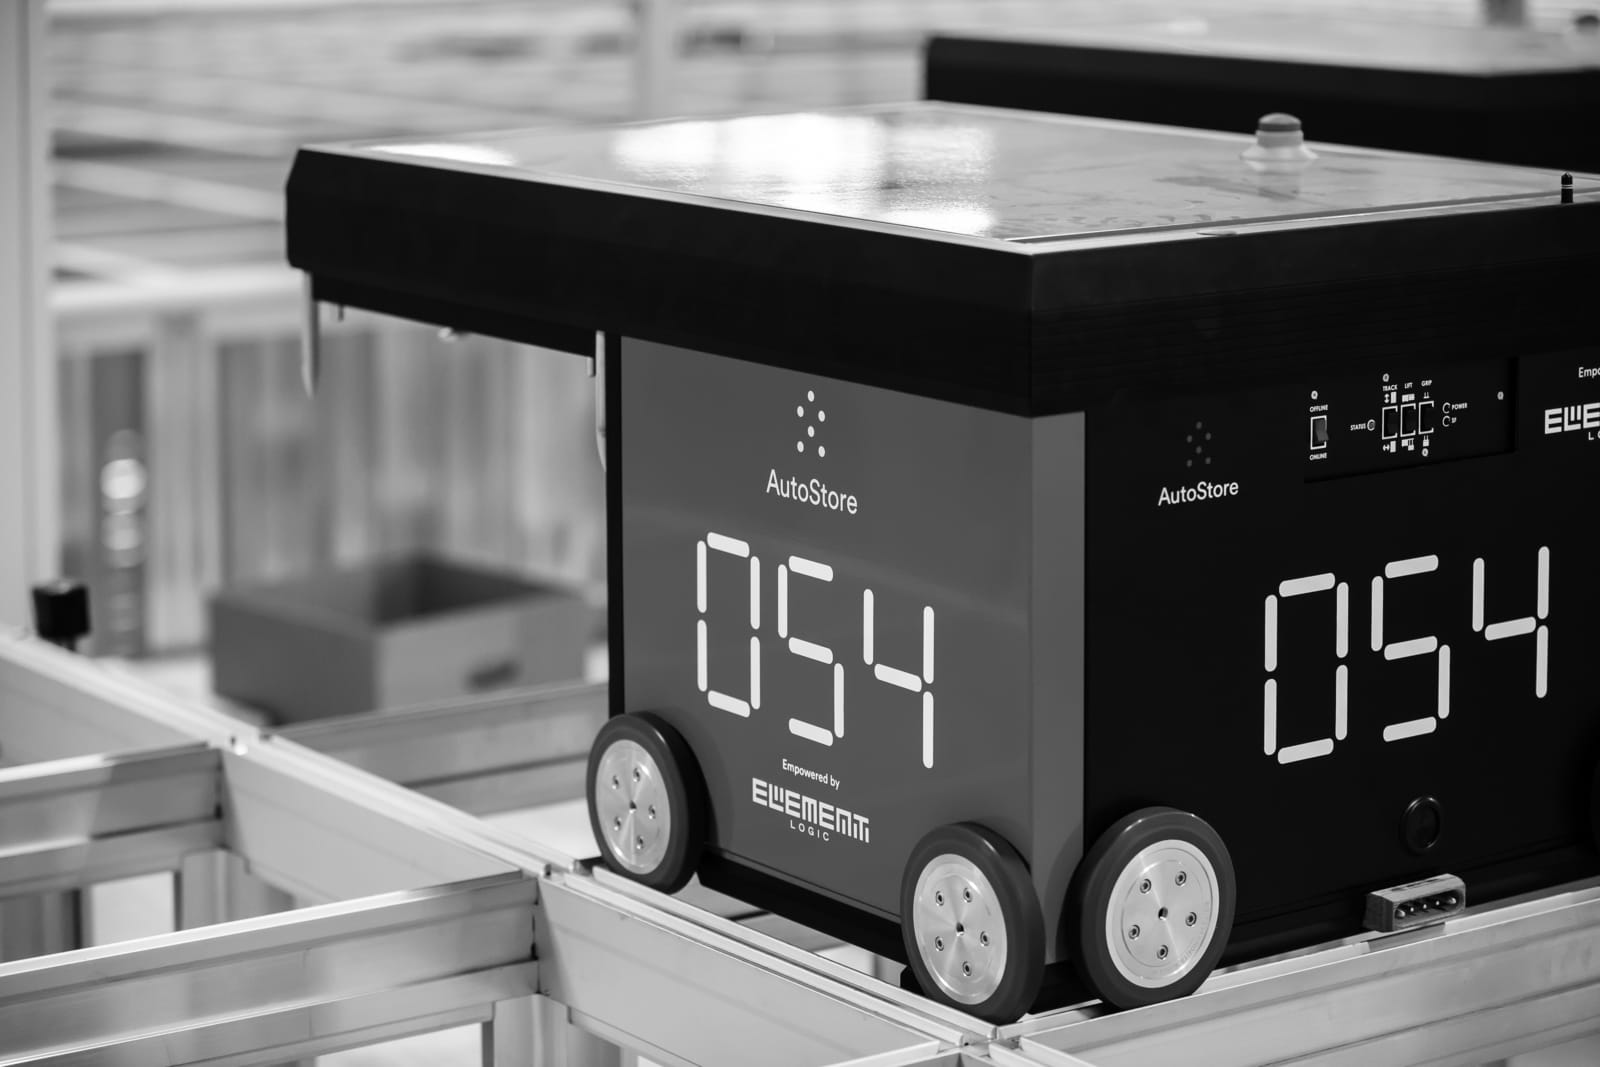 Red Line AutoStore-robot fotografert sort-hvitt.